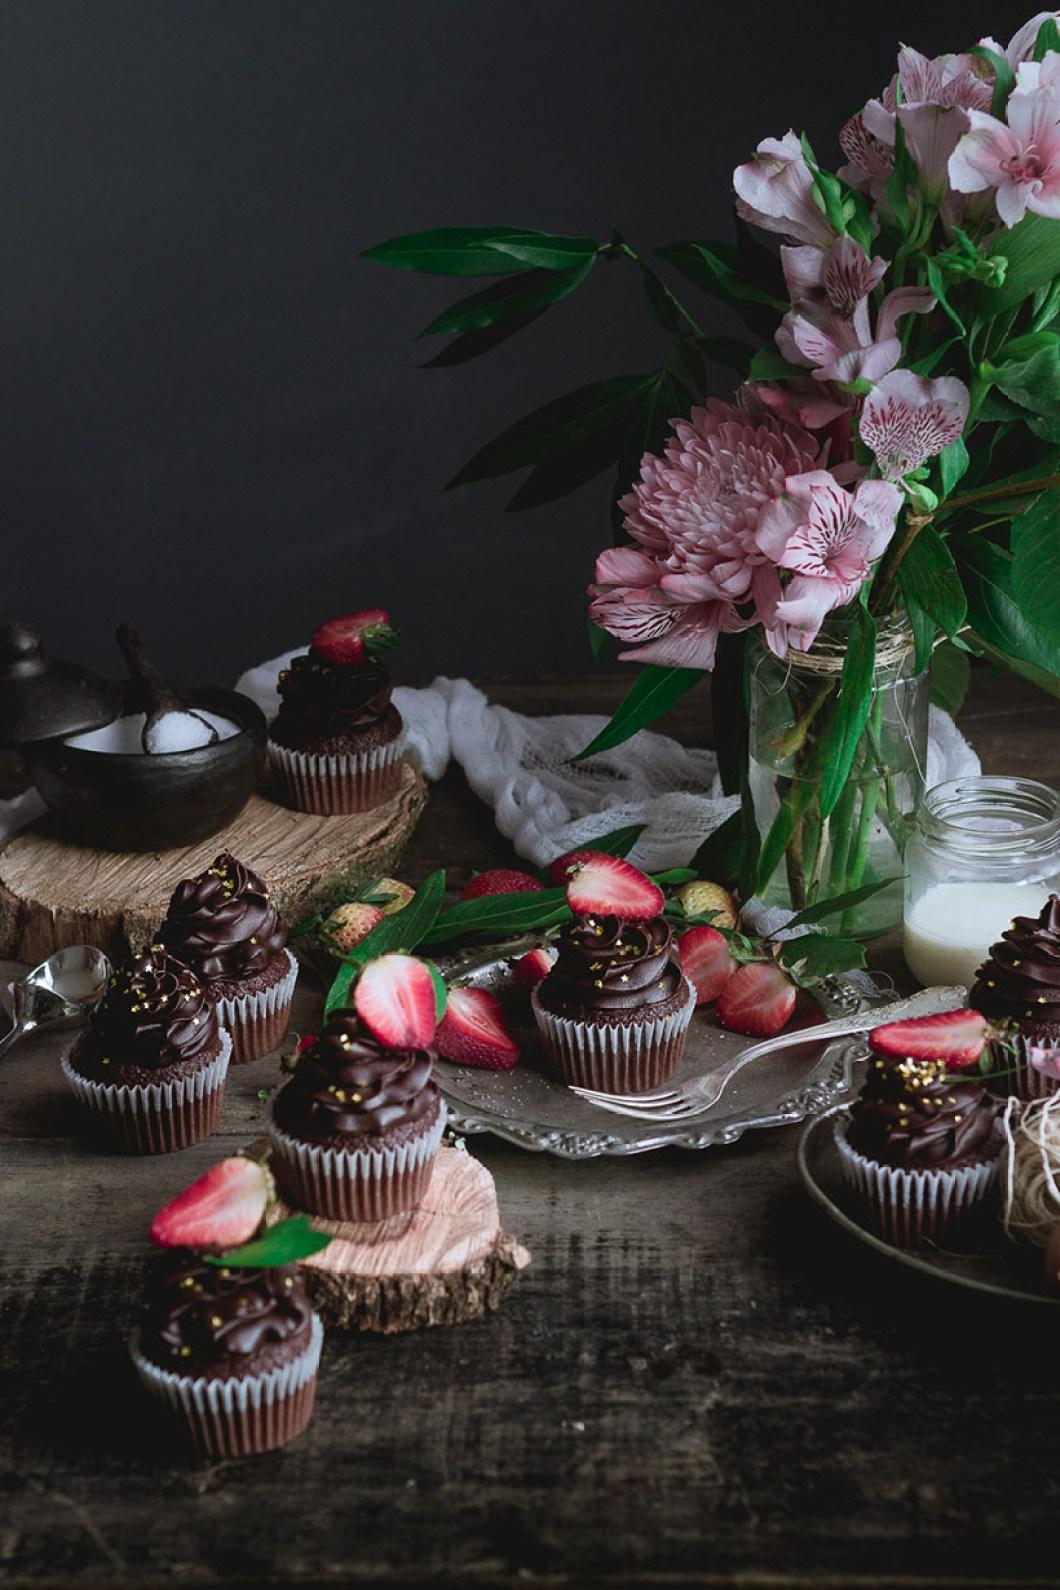 choco_cupcake_-3400-3